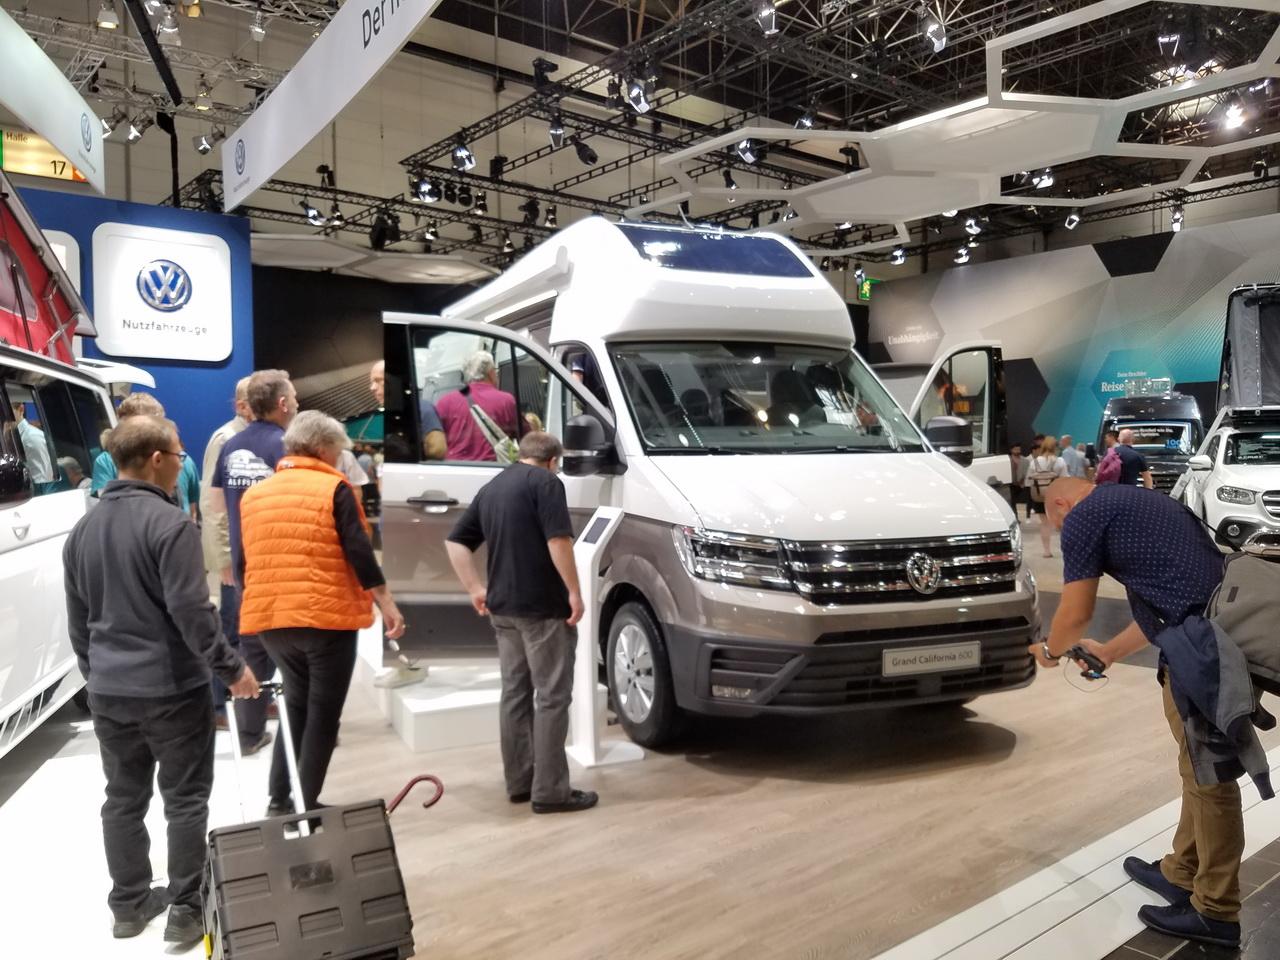 Volkswagen Grand California : visite guidée en vidéo - L'argus